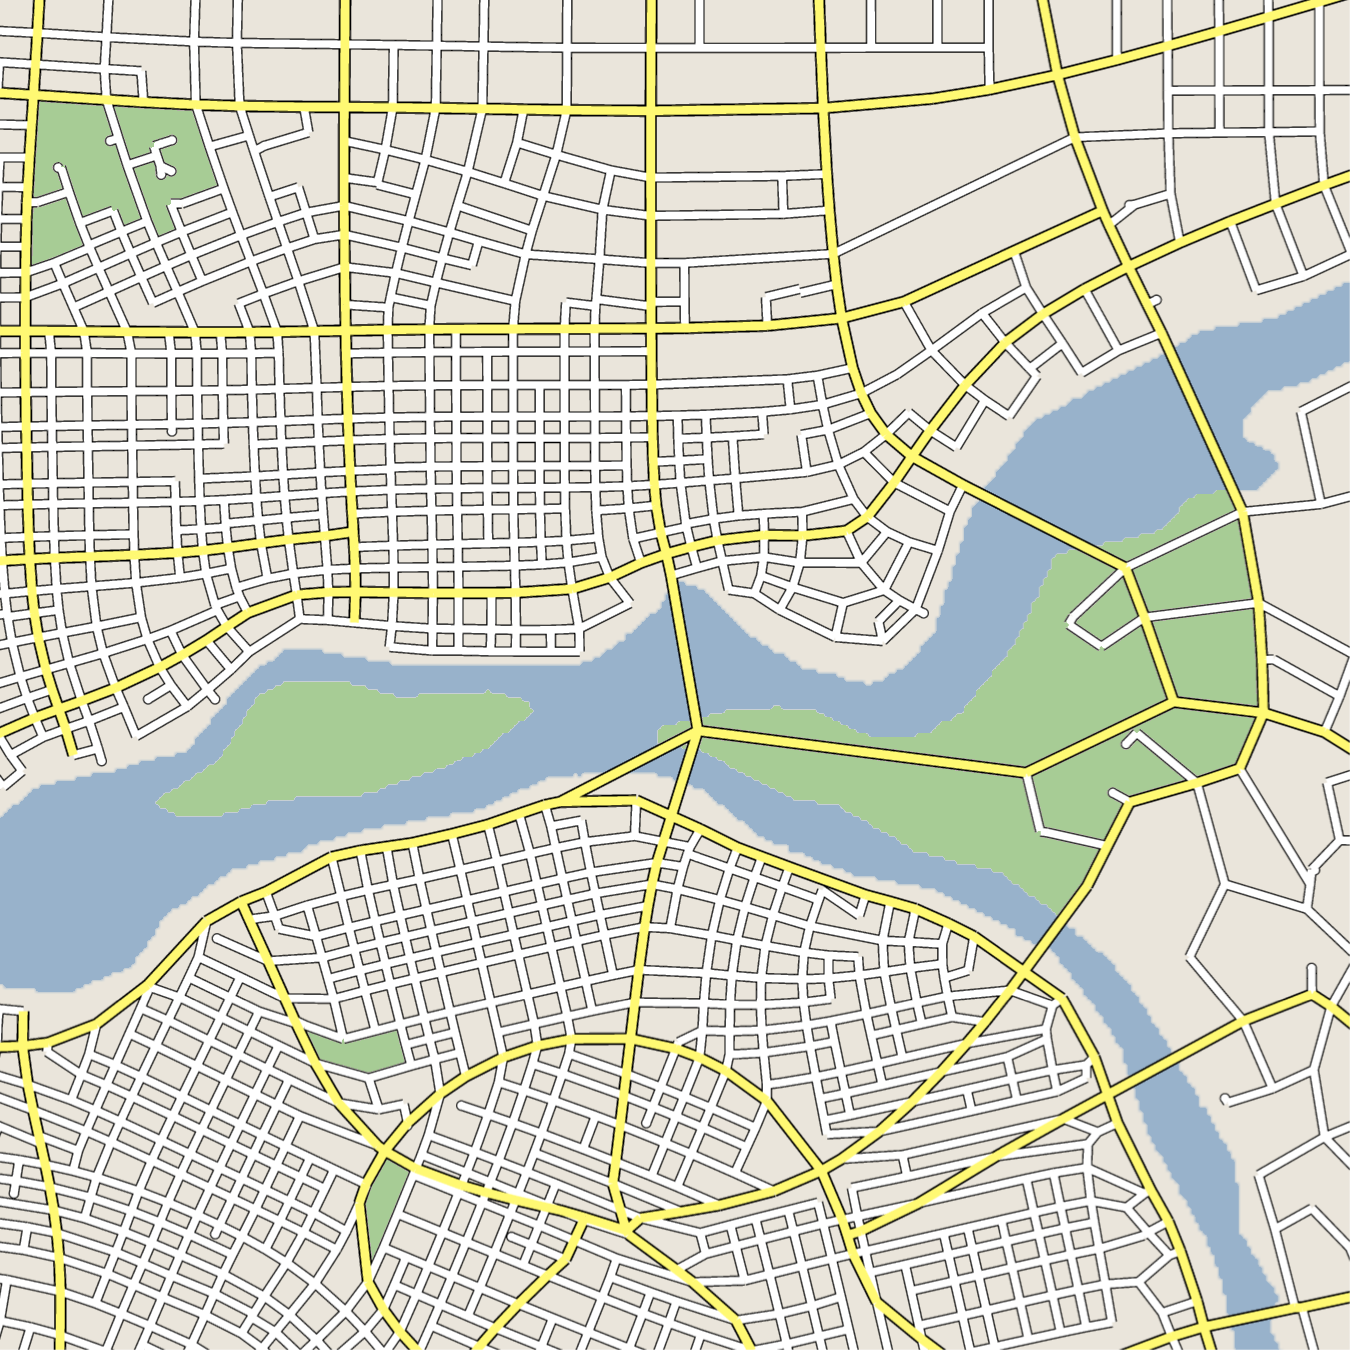 Interactive Procedural Street Modeling